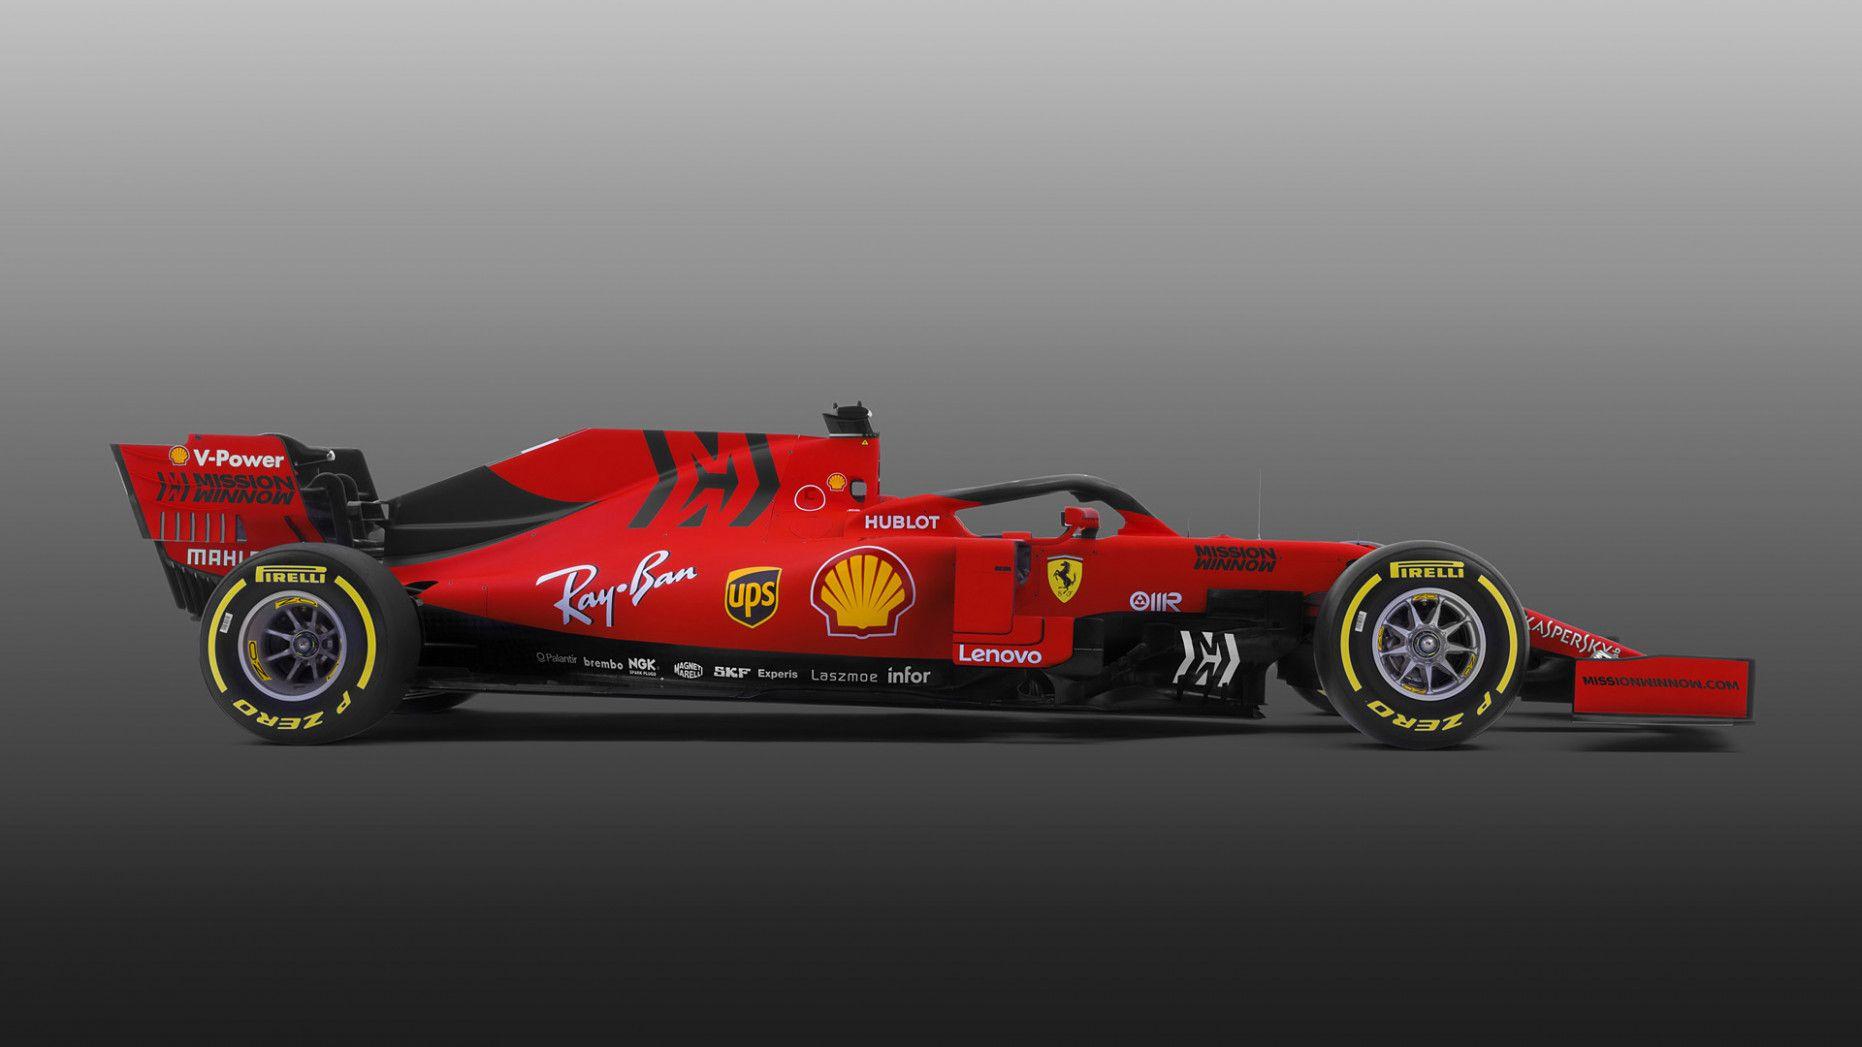 Ferrari F1 2020 Concept And Review Omnisportinterior Ferrari F1 2020 Lewis Hamilton Has Had A Sixth Formula One Appellation All Check More At Http Candel En 2020